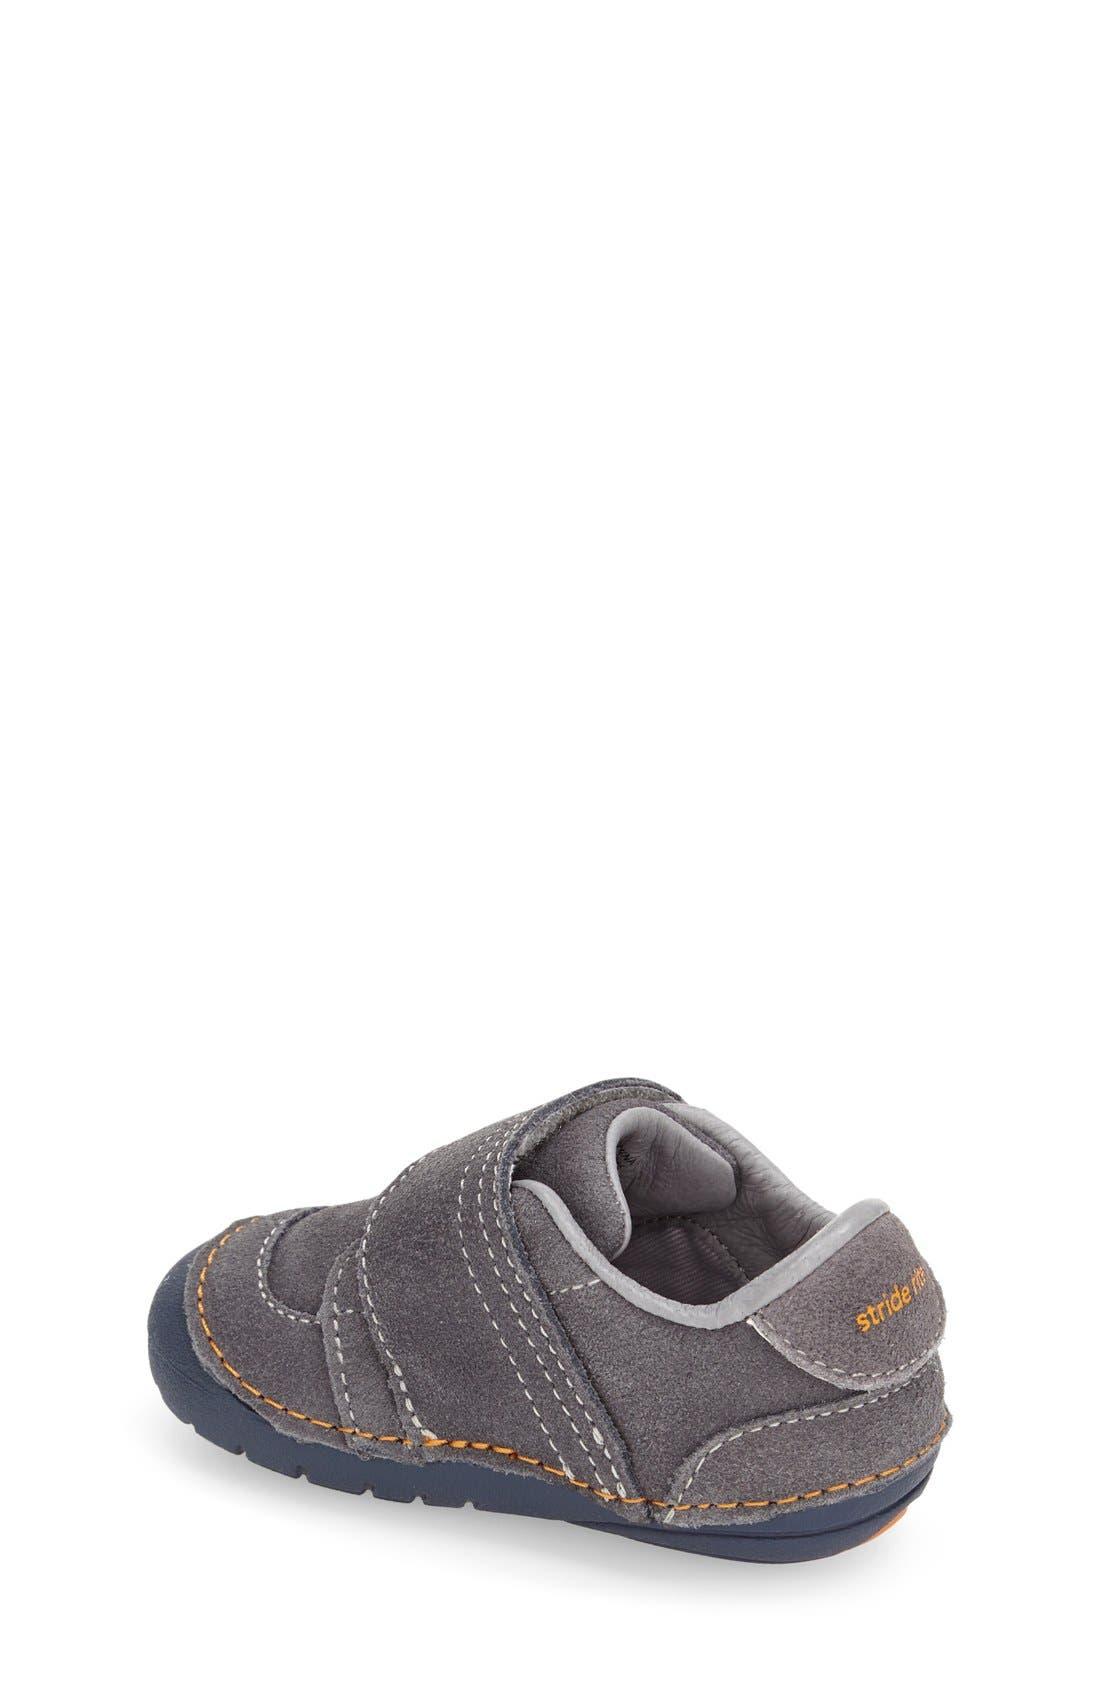 Soft Motion Kellen Sneaker,                             Alternate thumbnail 2, color,                             GREY